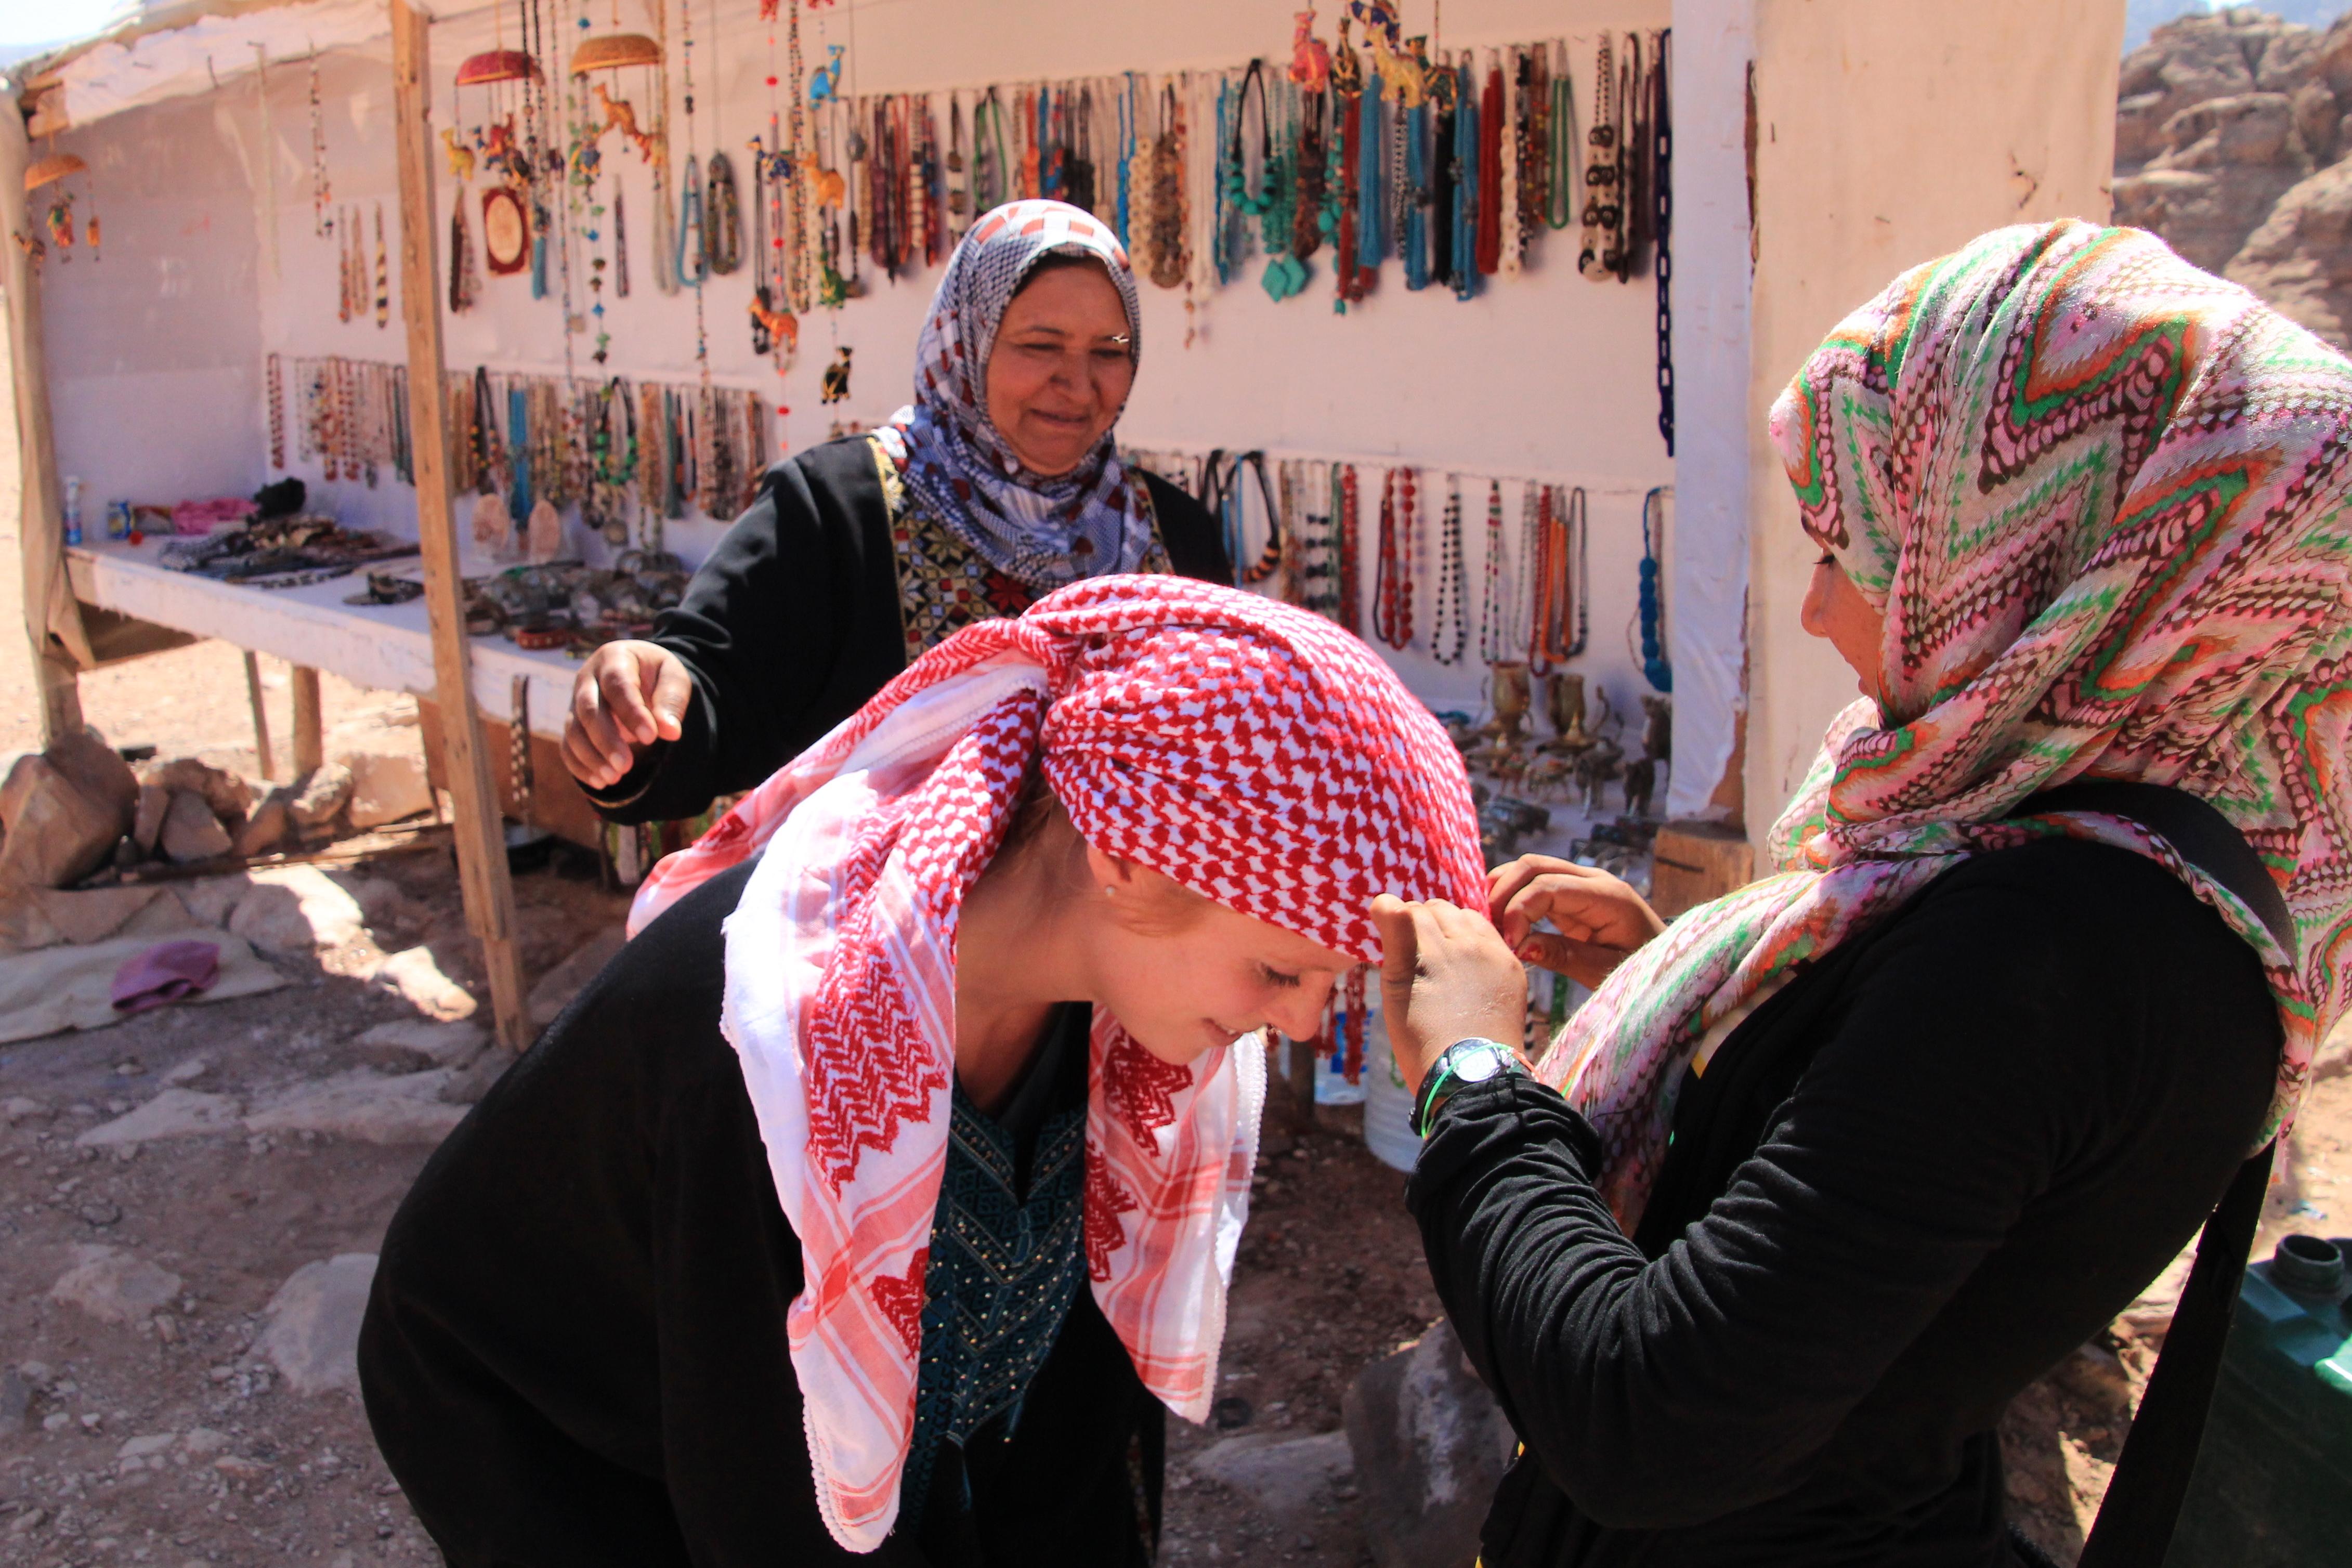 Original Jordanian Women Dress Code Lt  This Woman Is Wearing